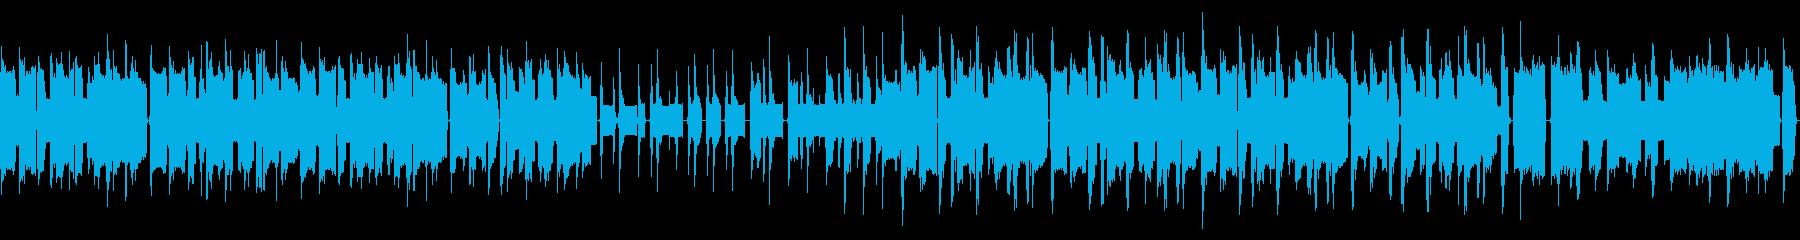 8bitで気怠い感じのコミカルなBGMの再生済みの波形